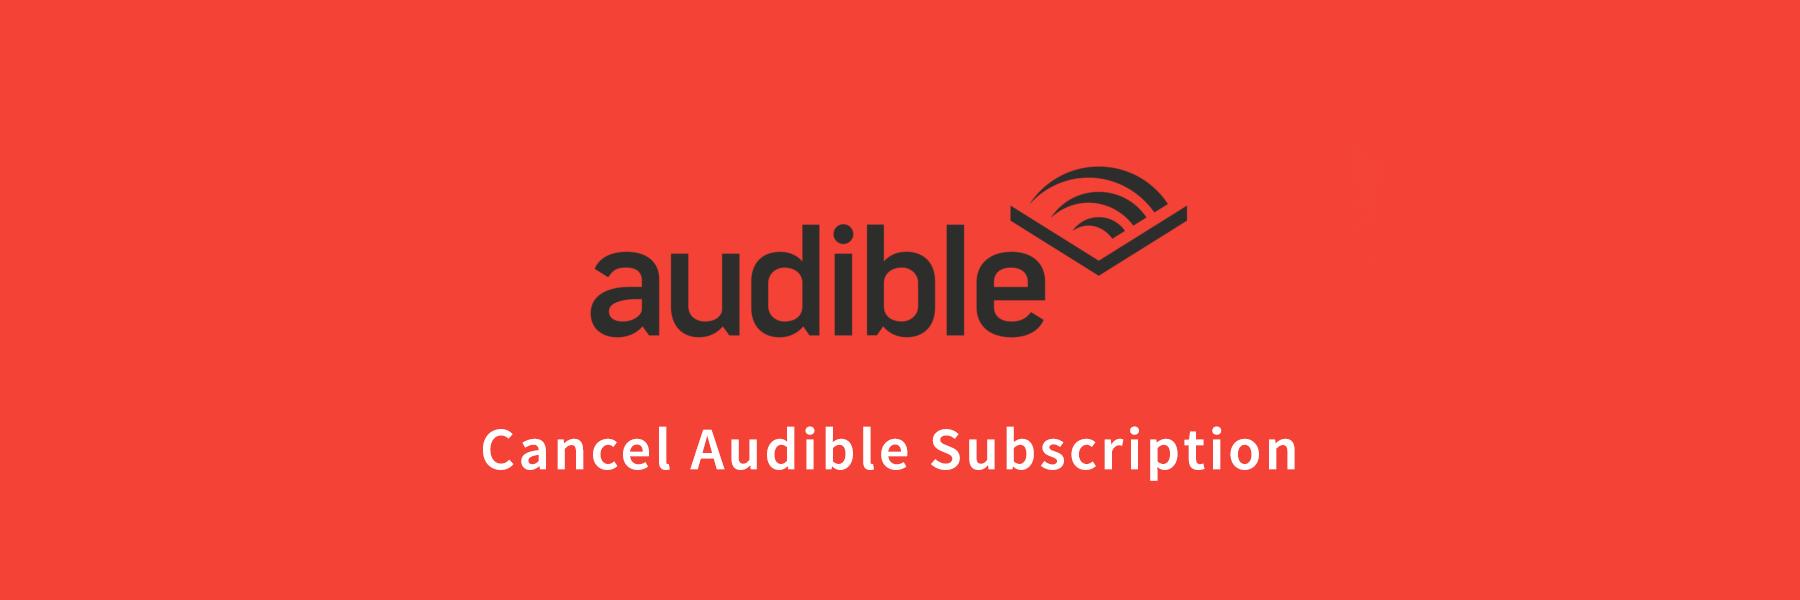 Cancel-Audible-Subscription